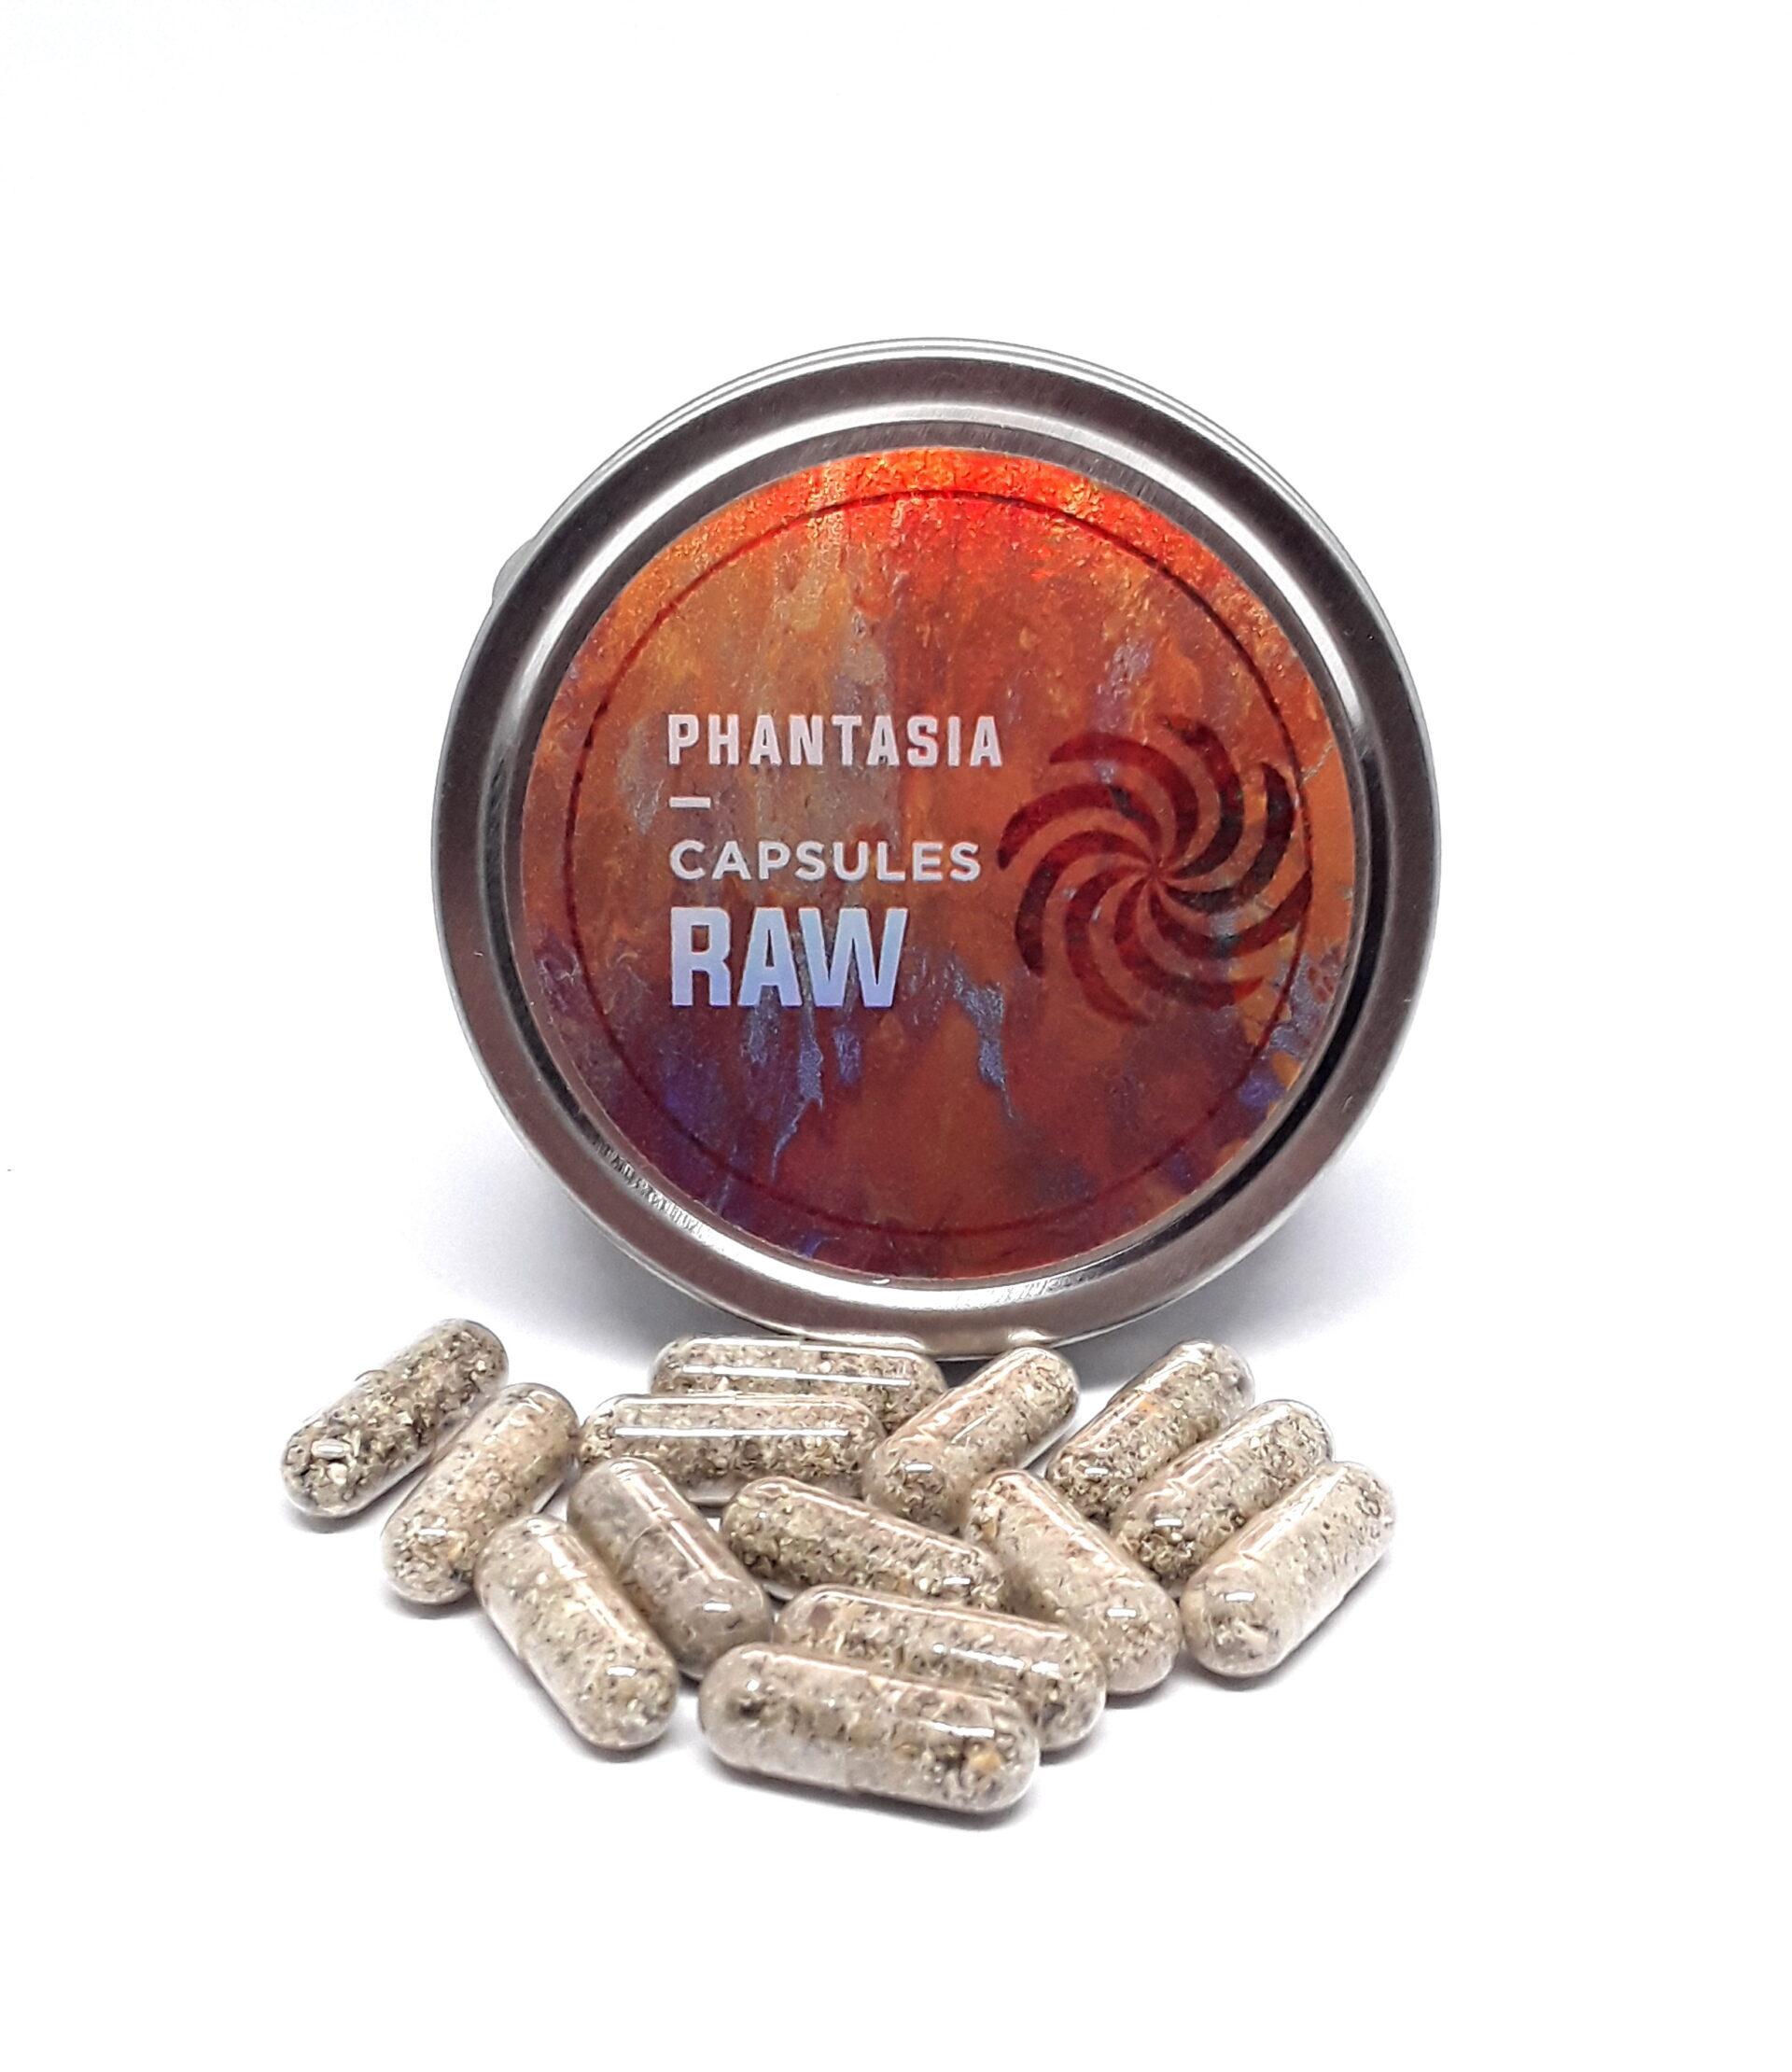 Phantasia Raw Psilocybin Micro-Dose Capsules